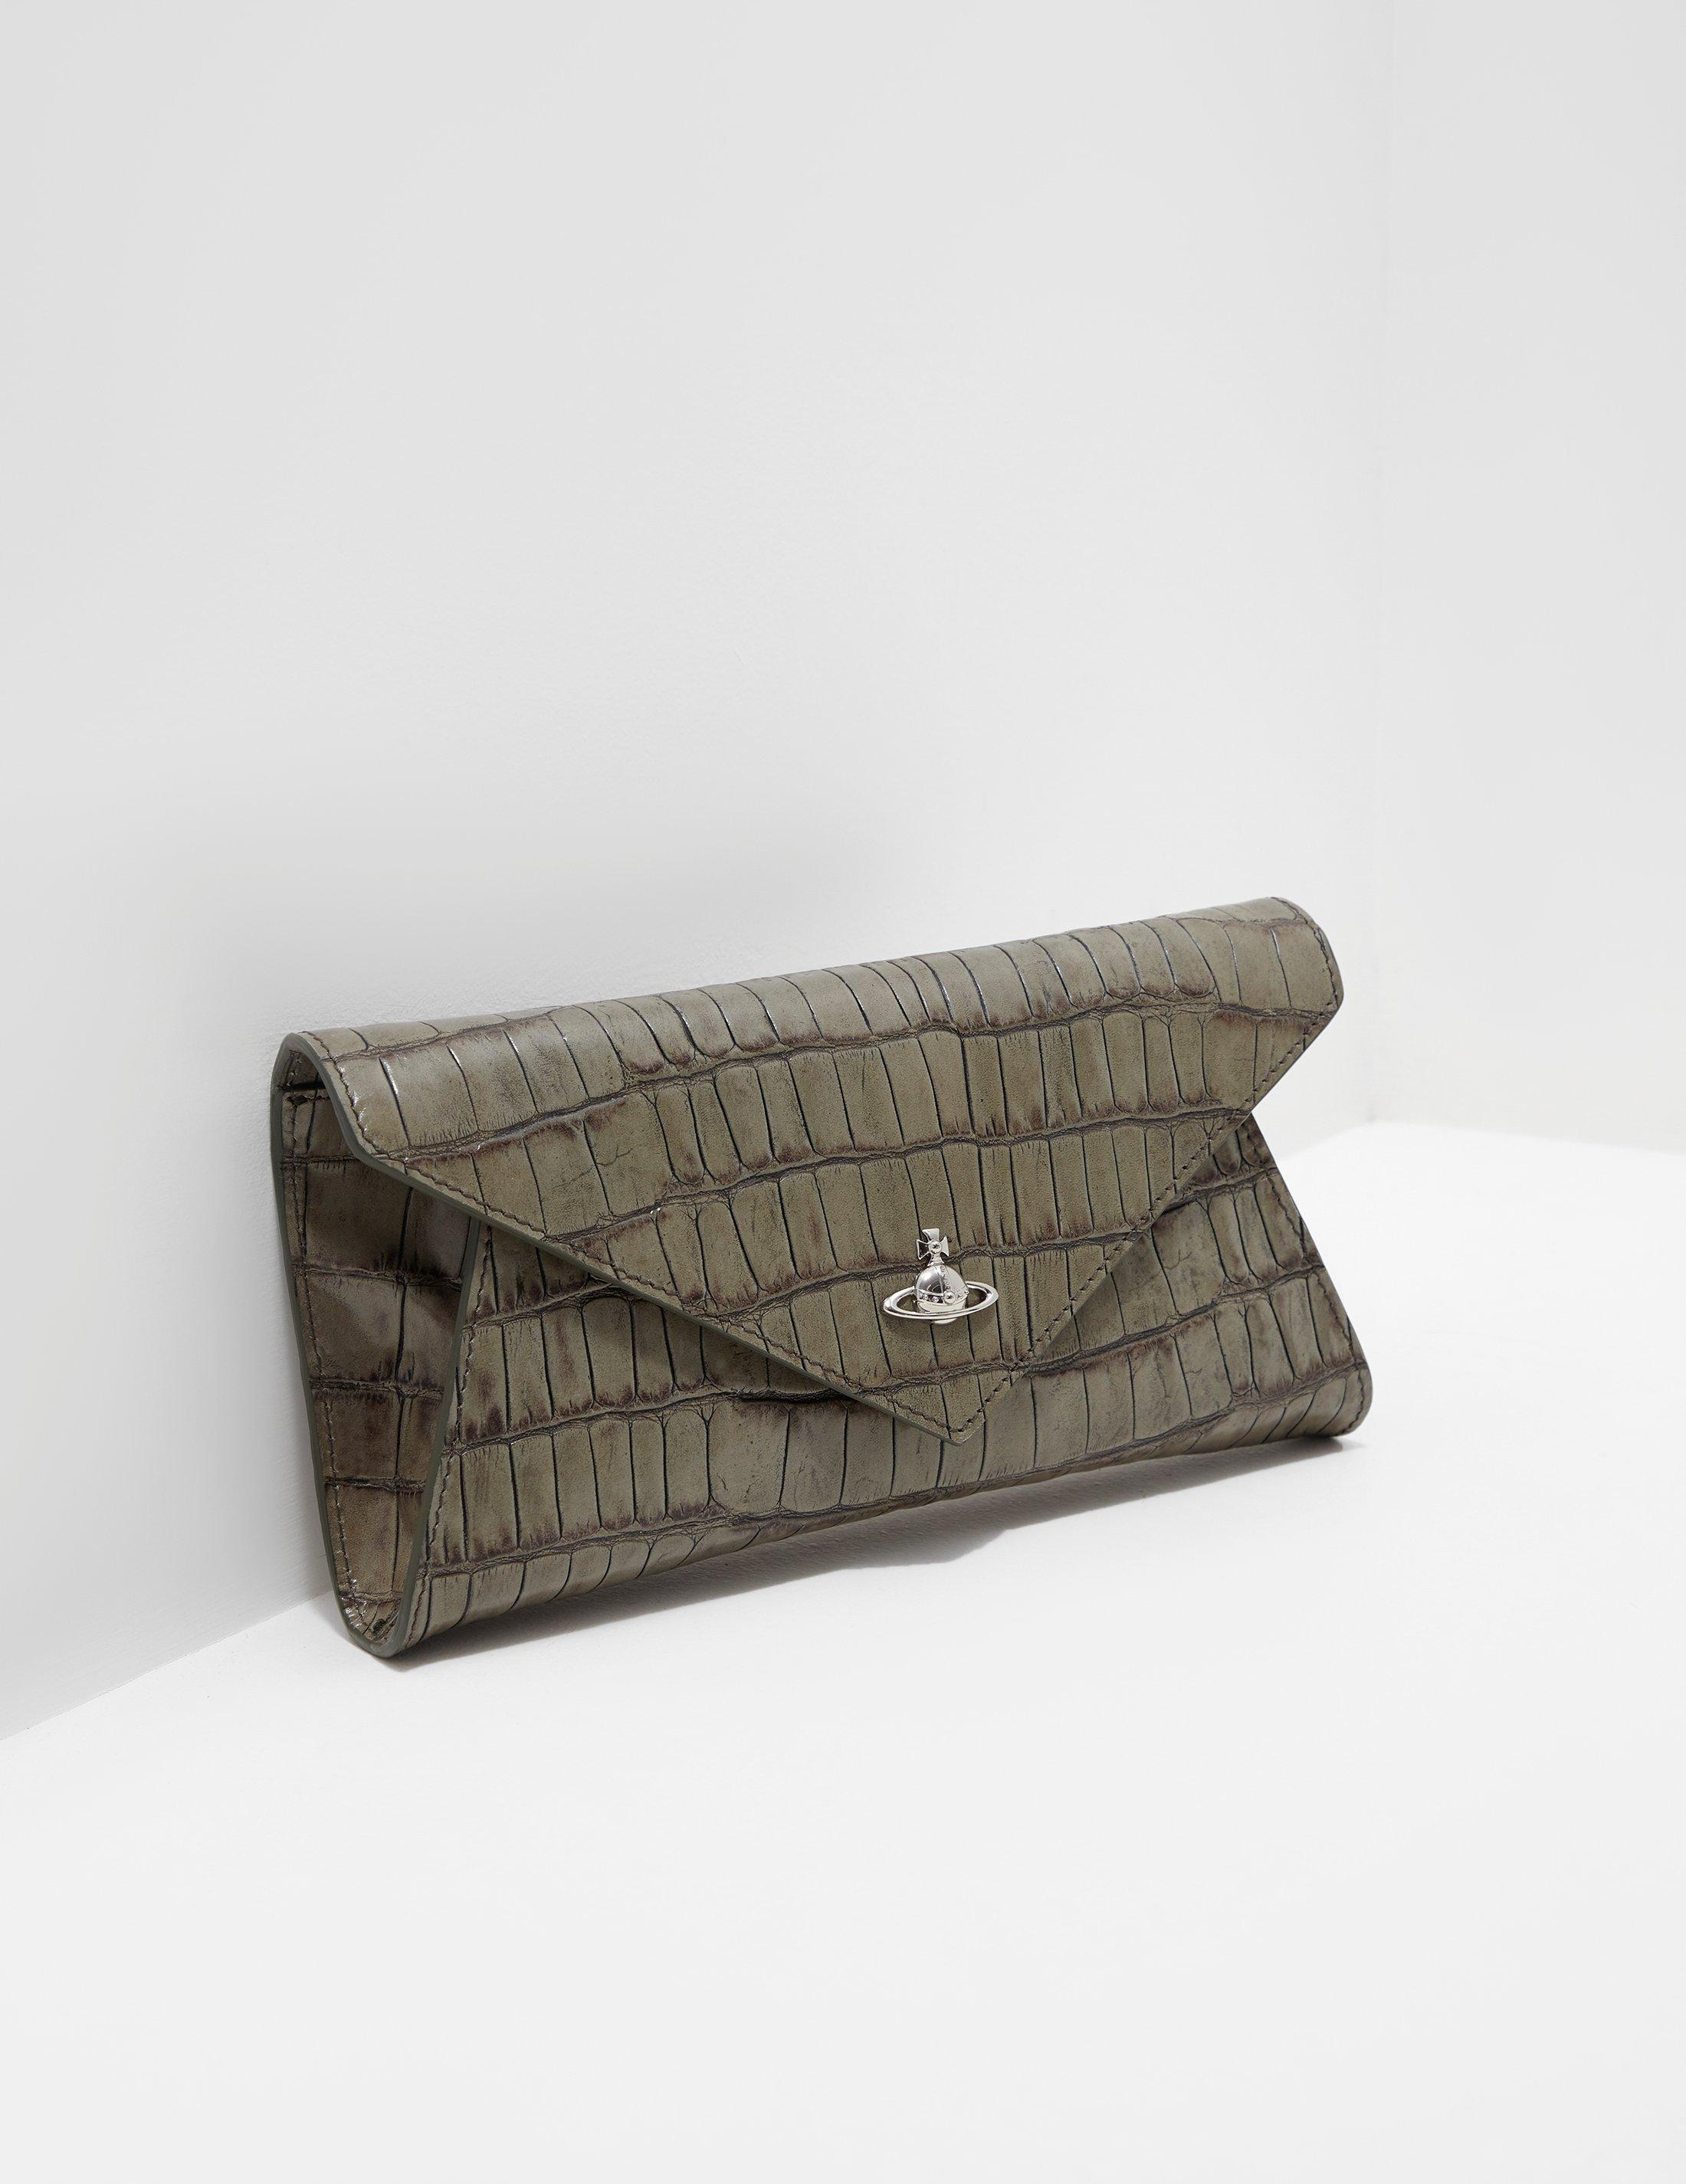 53920bc97f4 Vivienne Westwood Lisa Croc Envelope Clutch Bag - Online Exclusive ...